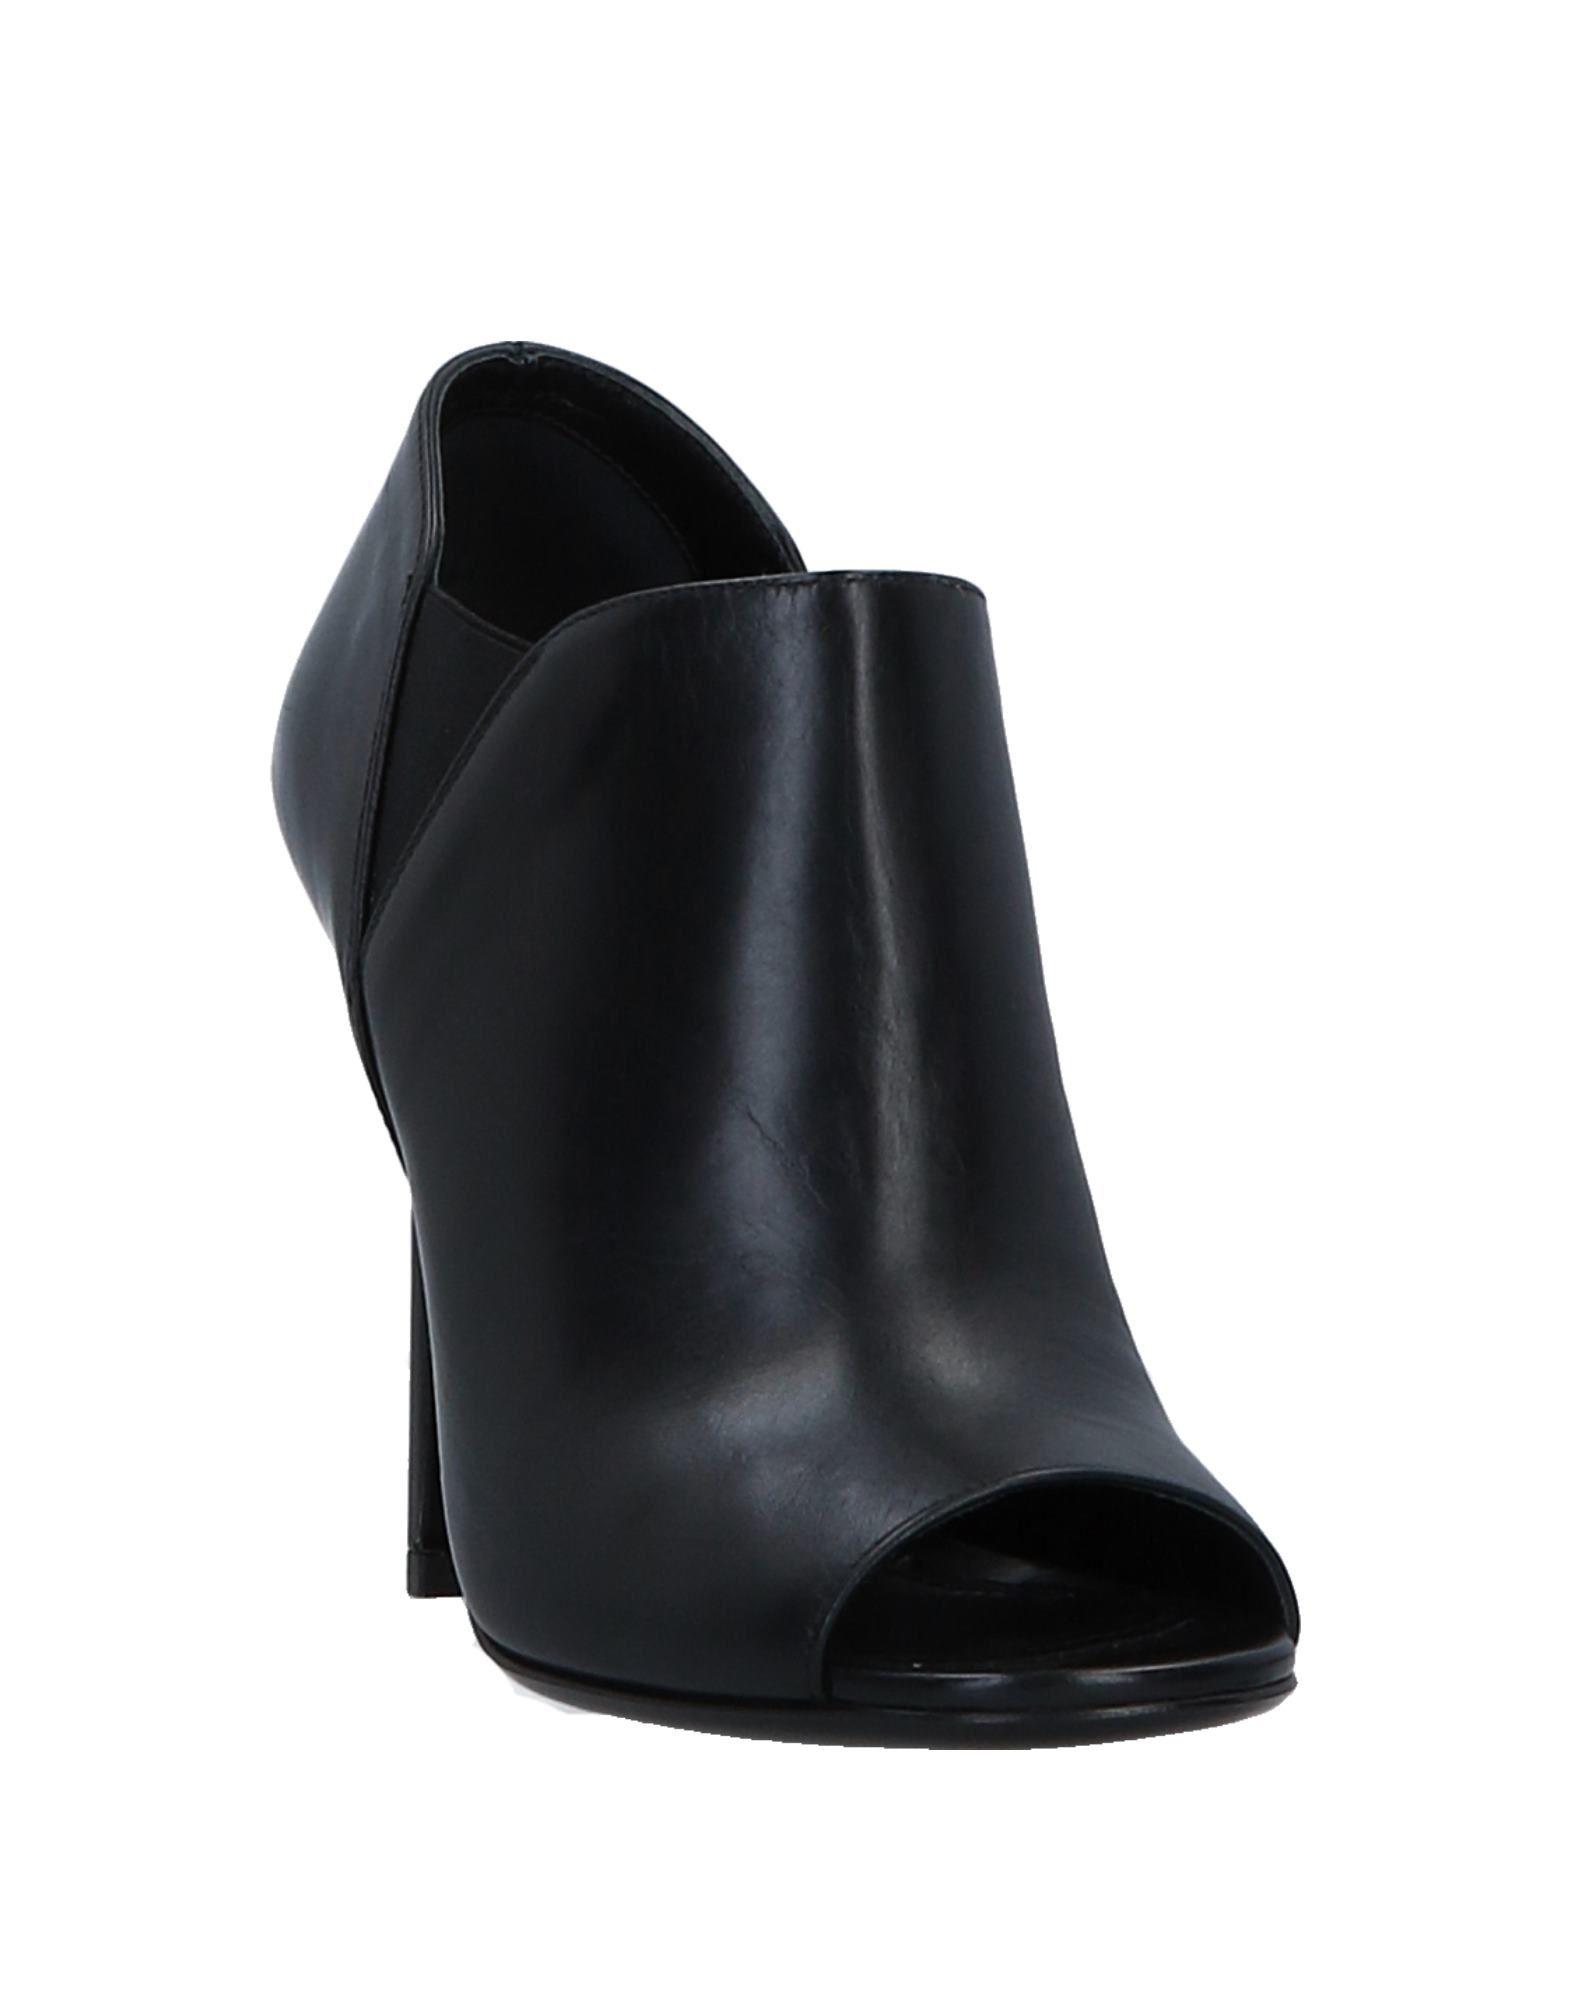 Rabatt  Schuhe Prada Stiefelette Damen  Rabatt 11516778JC 54515d